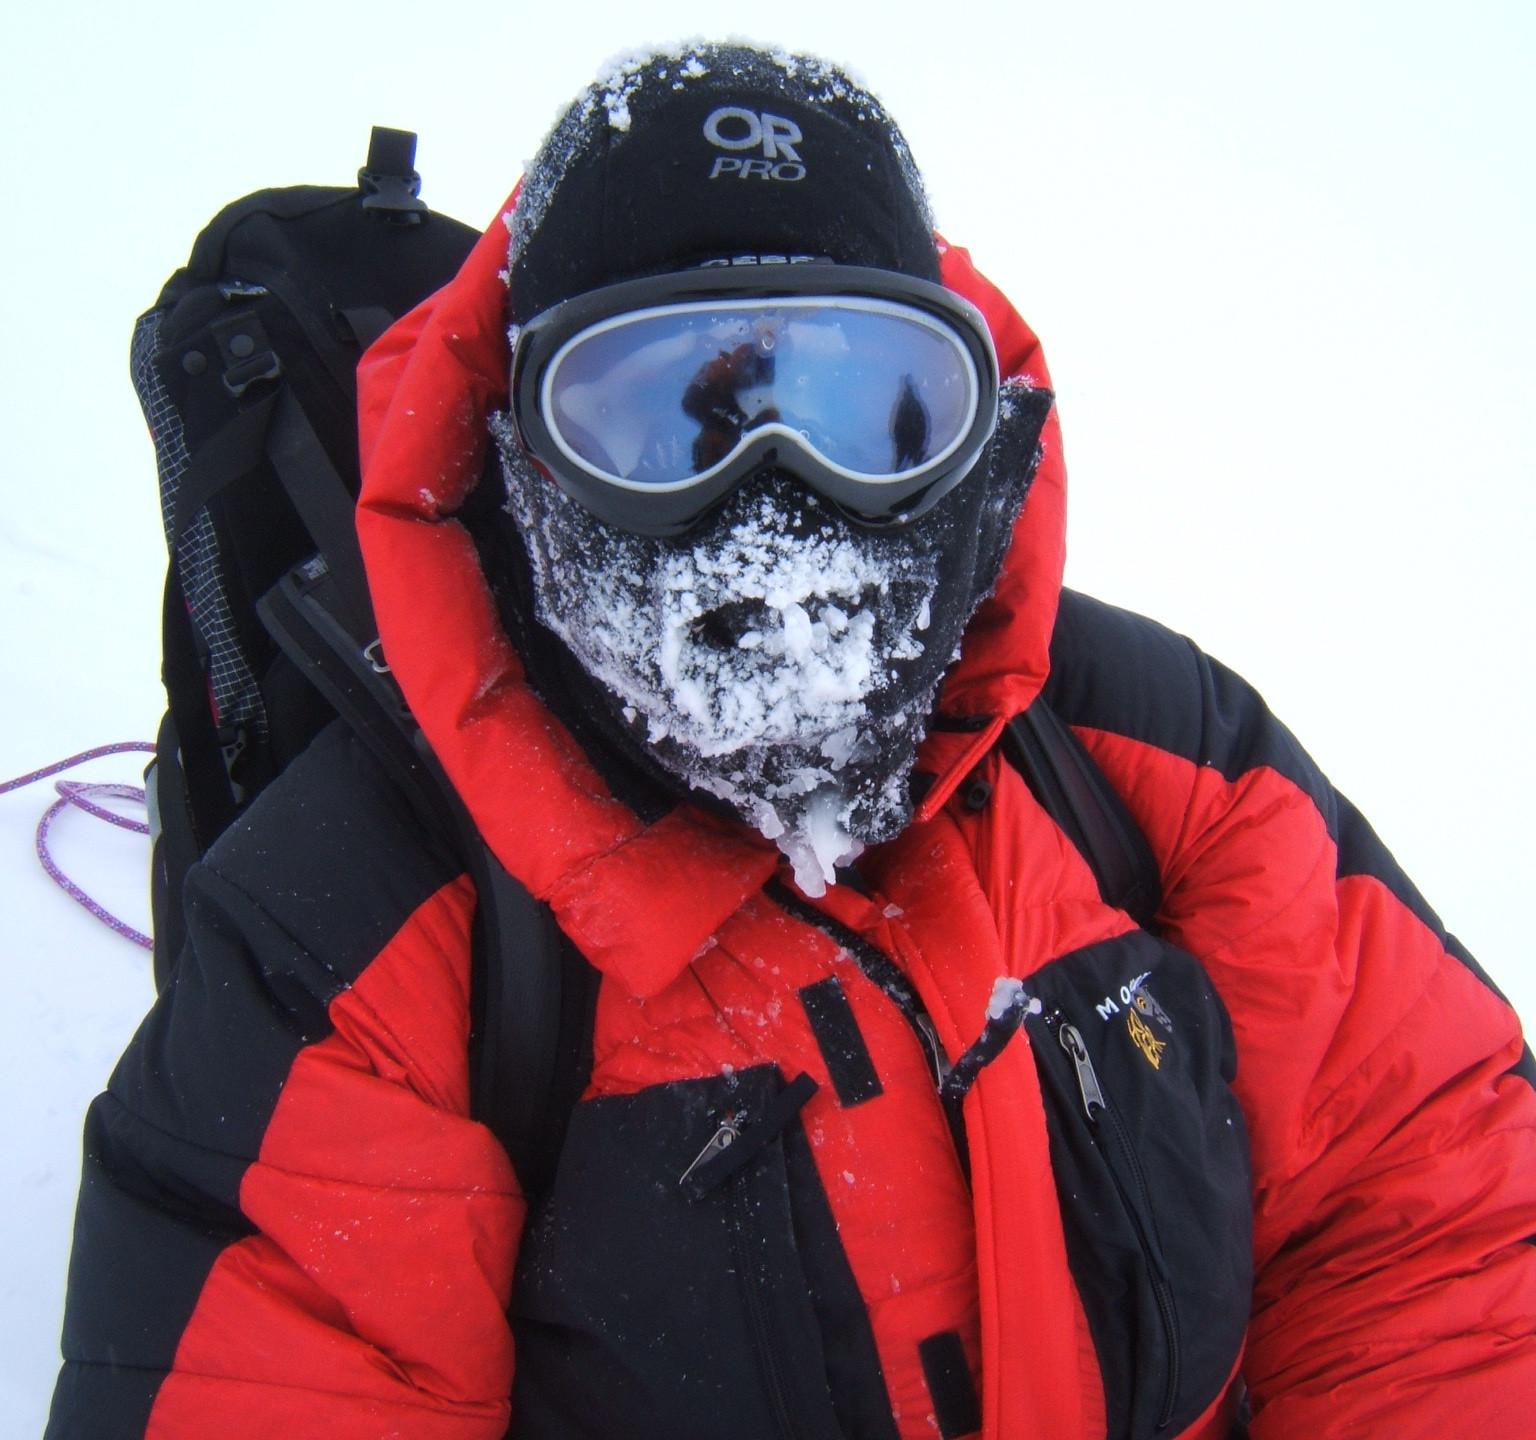 Frozen face at minus 40